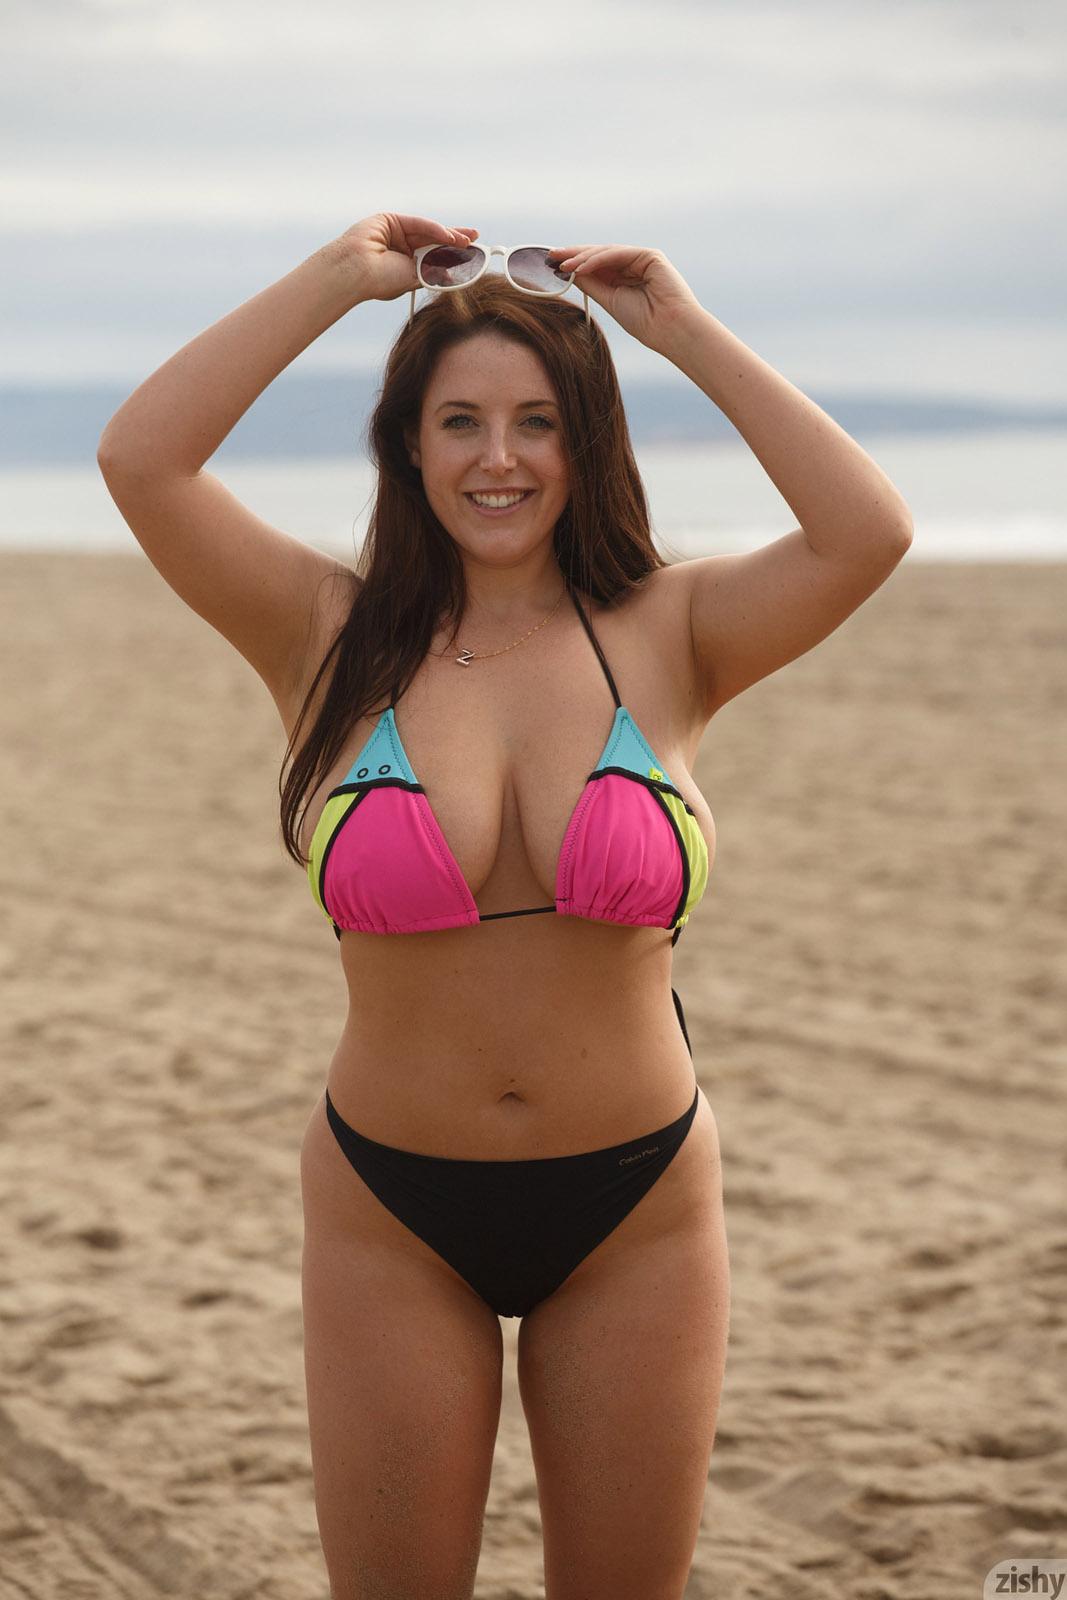 Angela White Porn Lesbian In The Beach angela white beach day flasher for zishy - curvy erotic